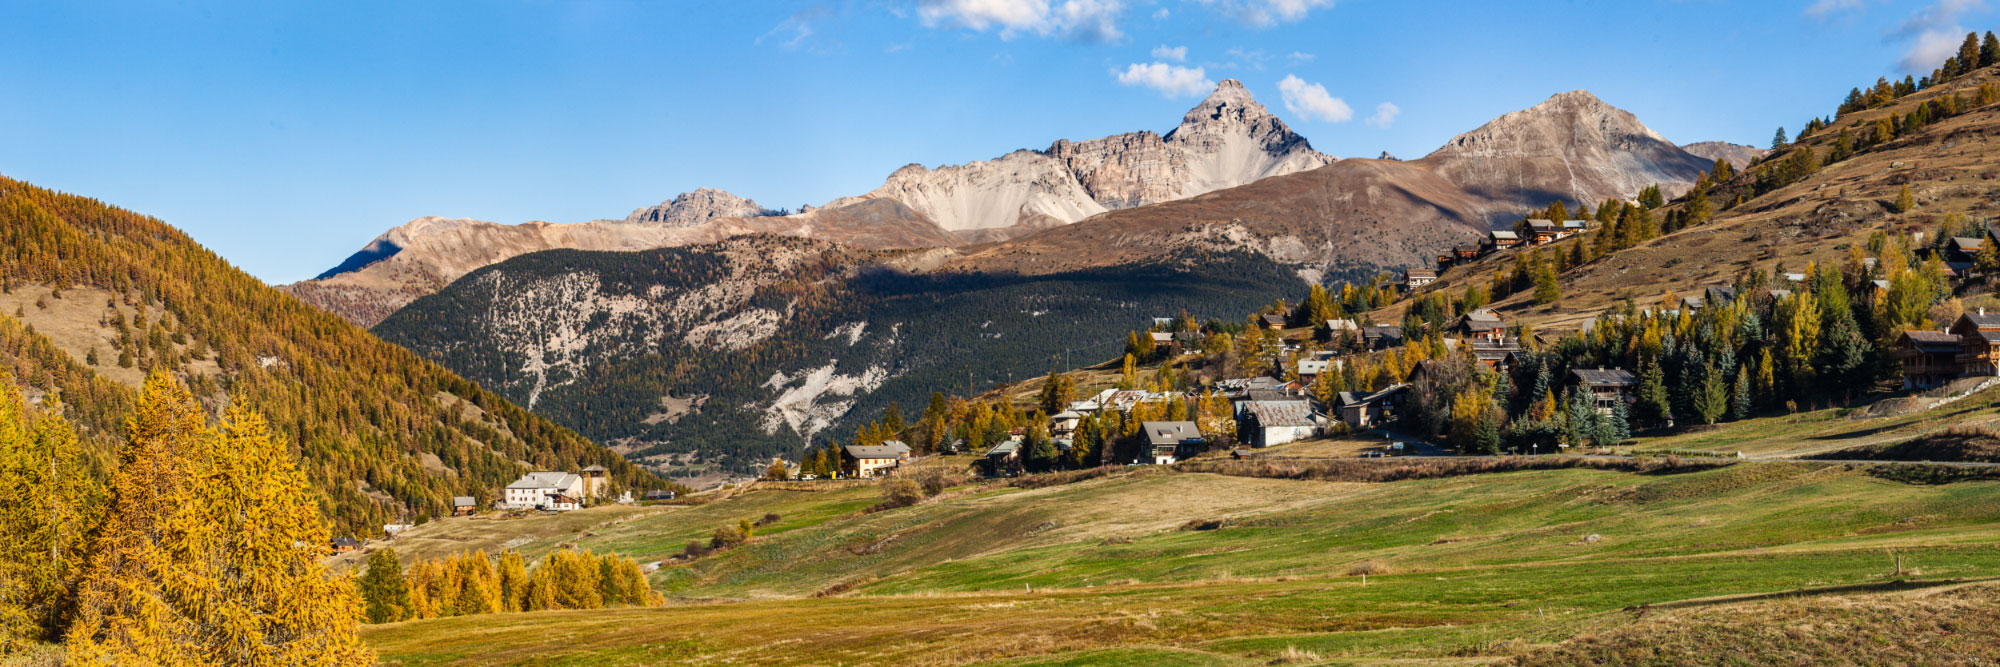 Molines-en-Queyras, Hautes-Alpes - Herve Sentucq Photo ...